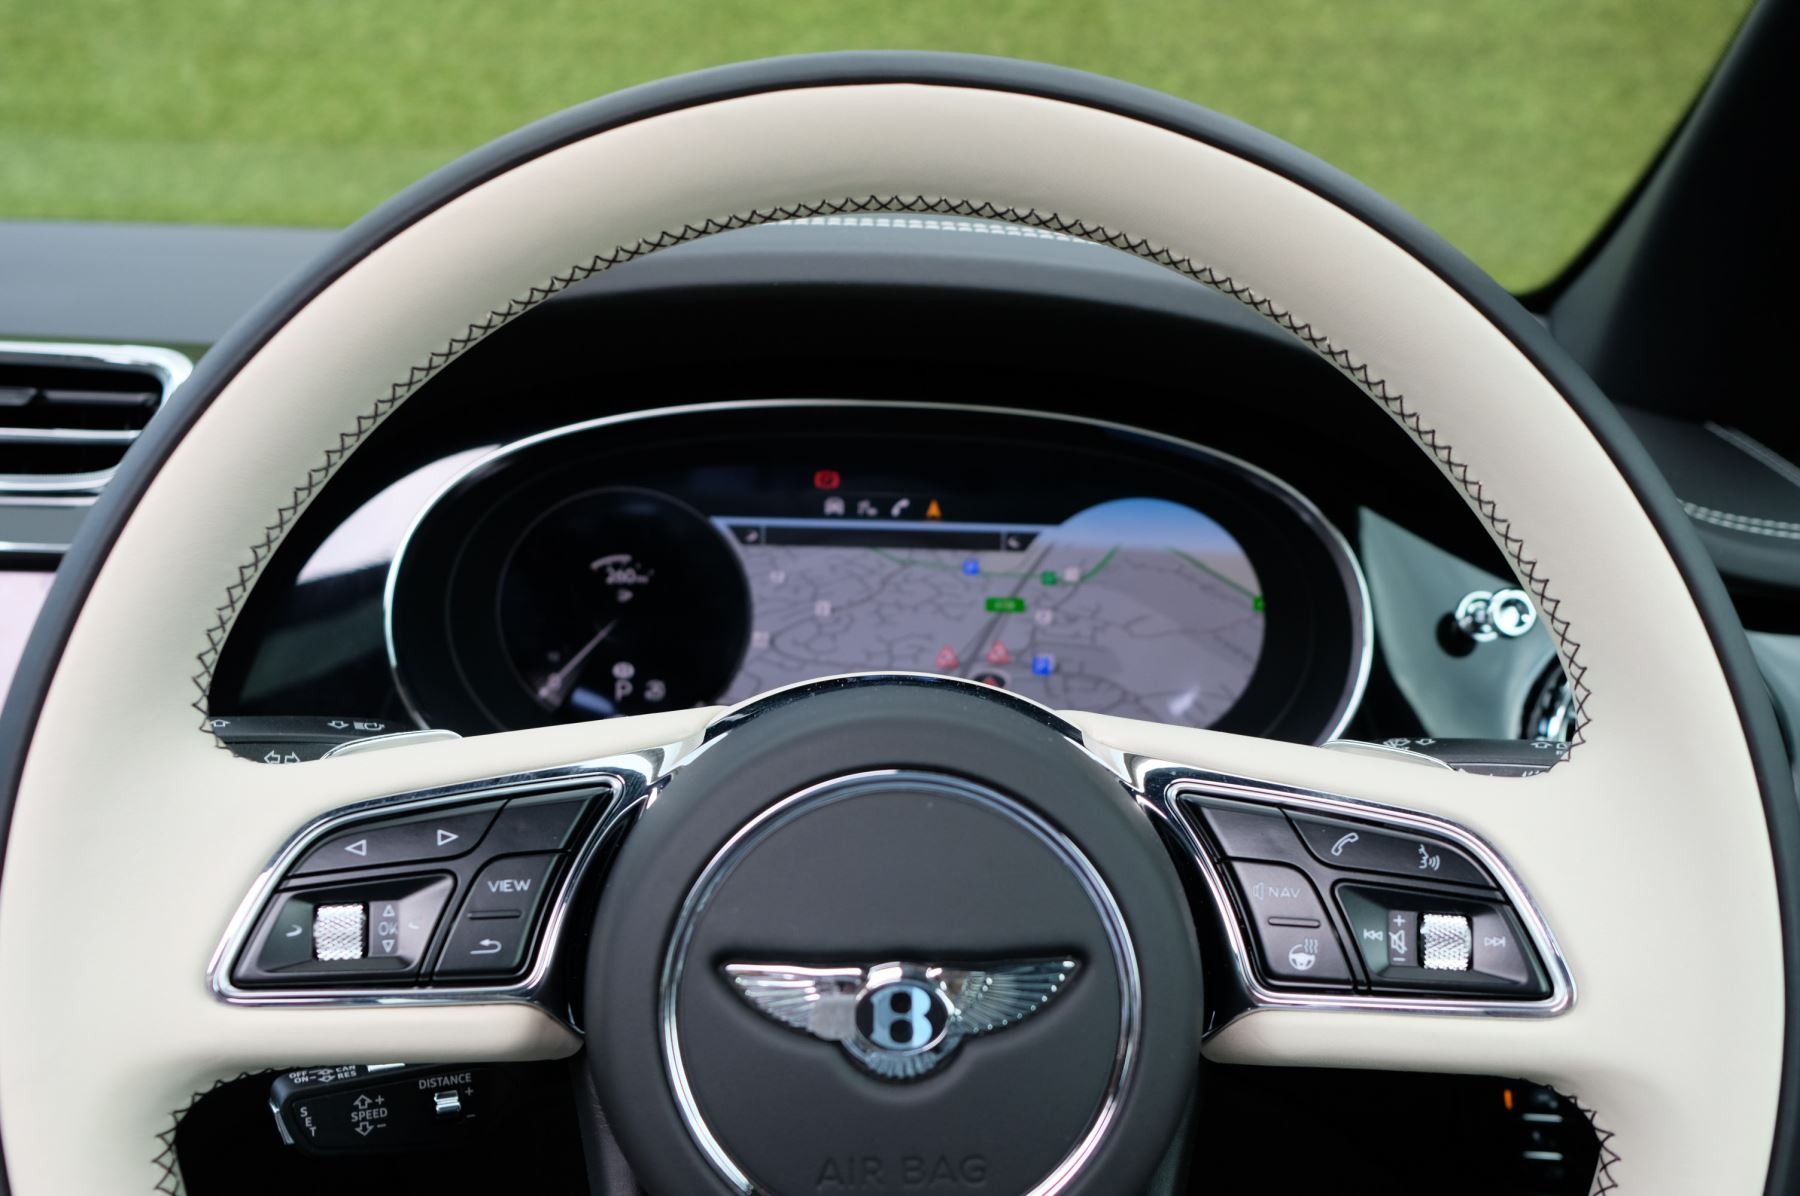 Bentley Bentayga 4.0 V8 - Mulliner Driving Specification for Black Specification image 17